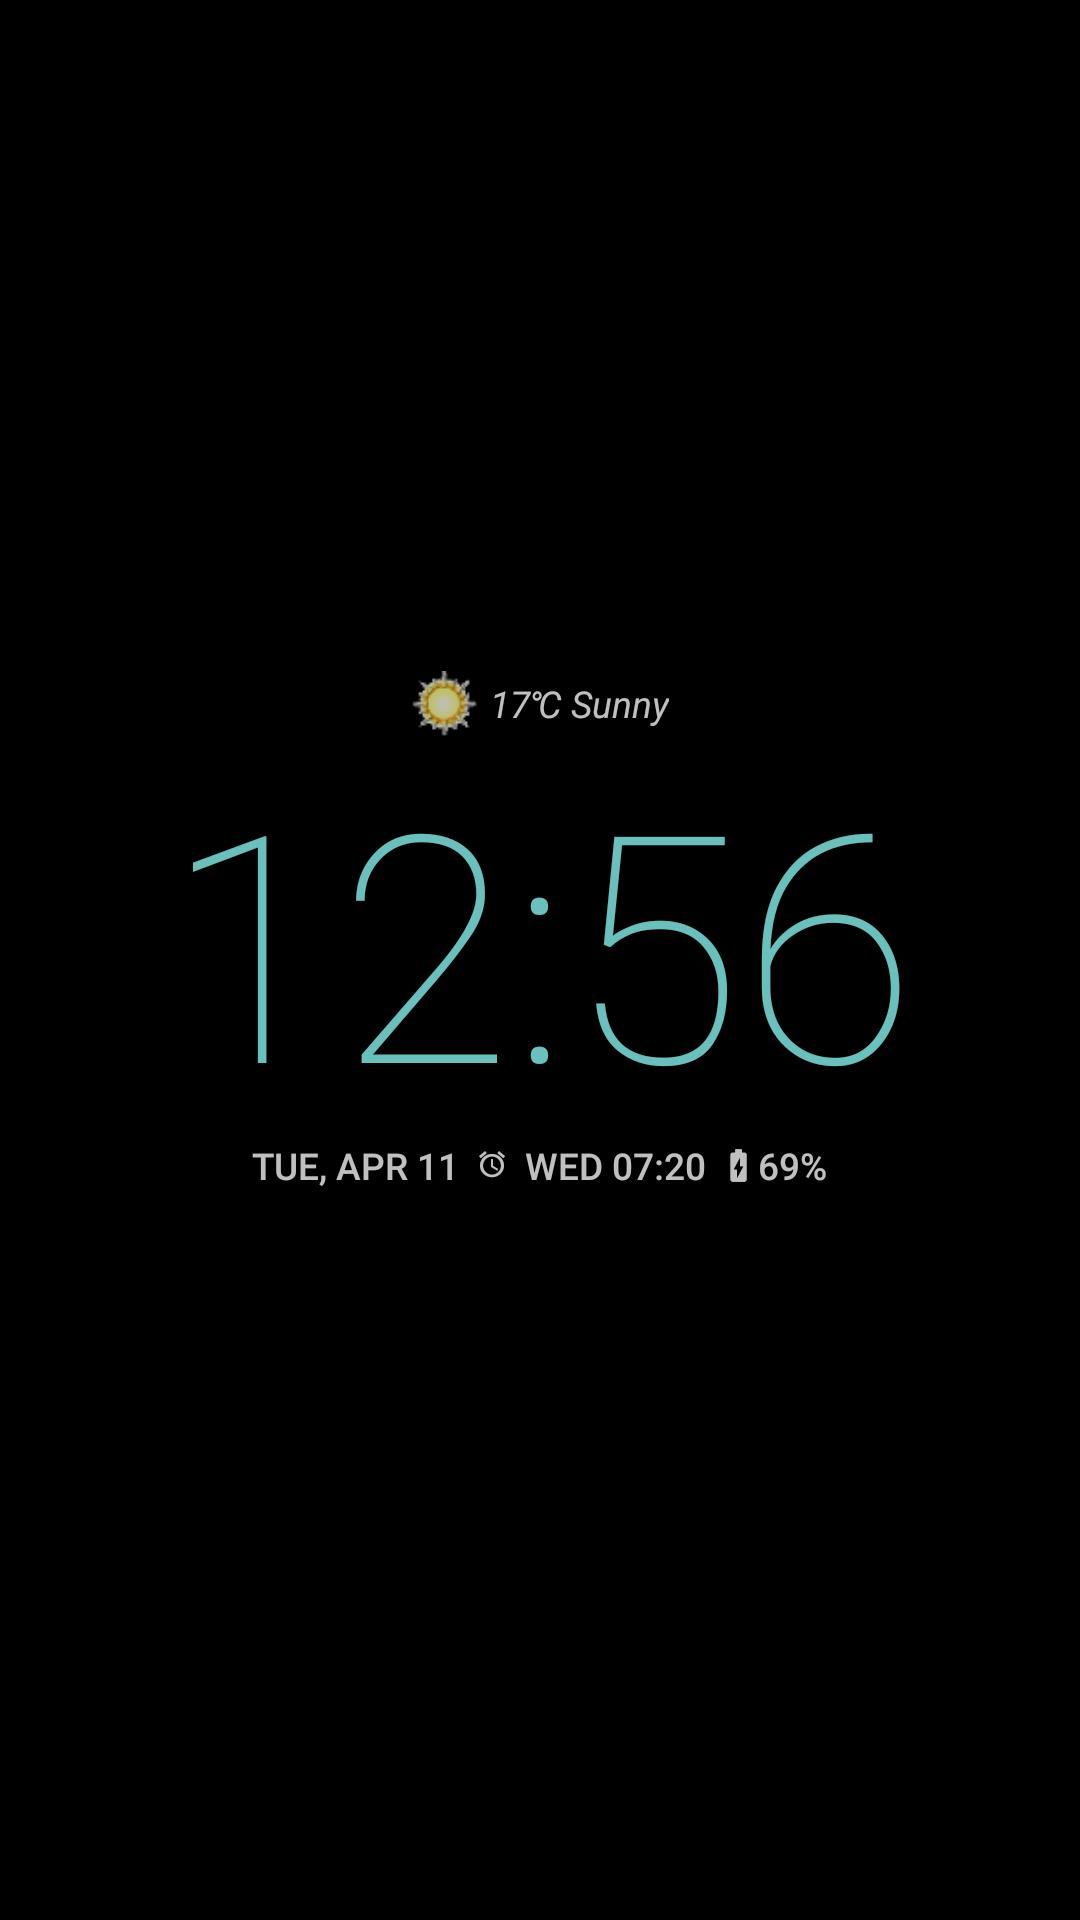 Desk Clock Screensaver for Android - APK Download